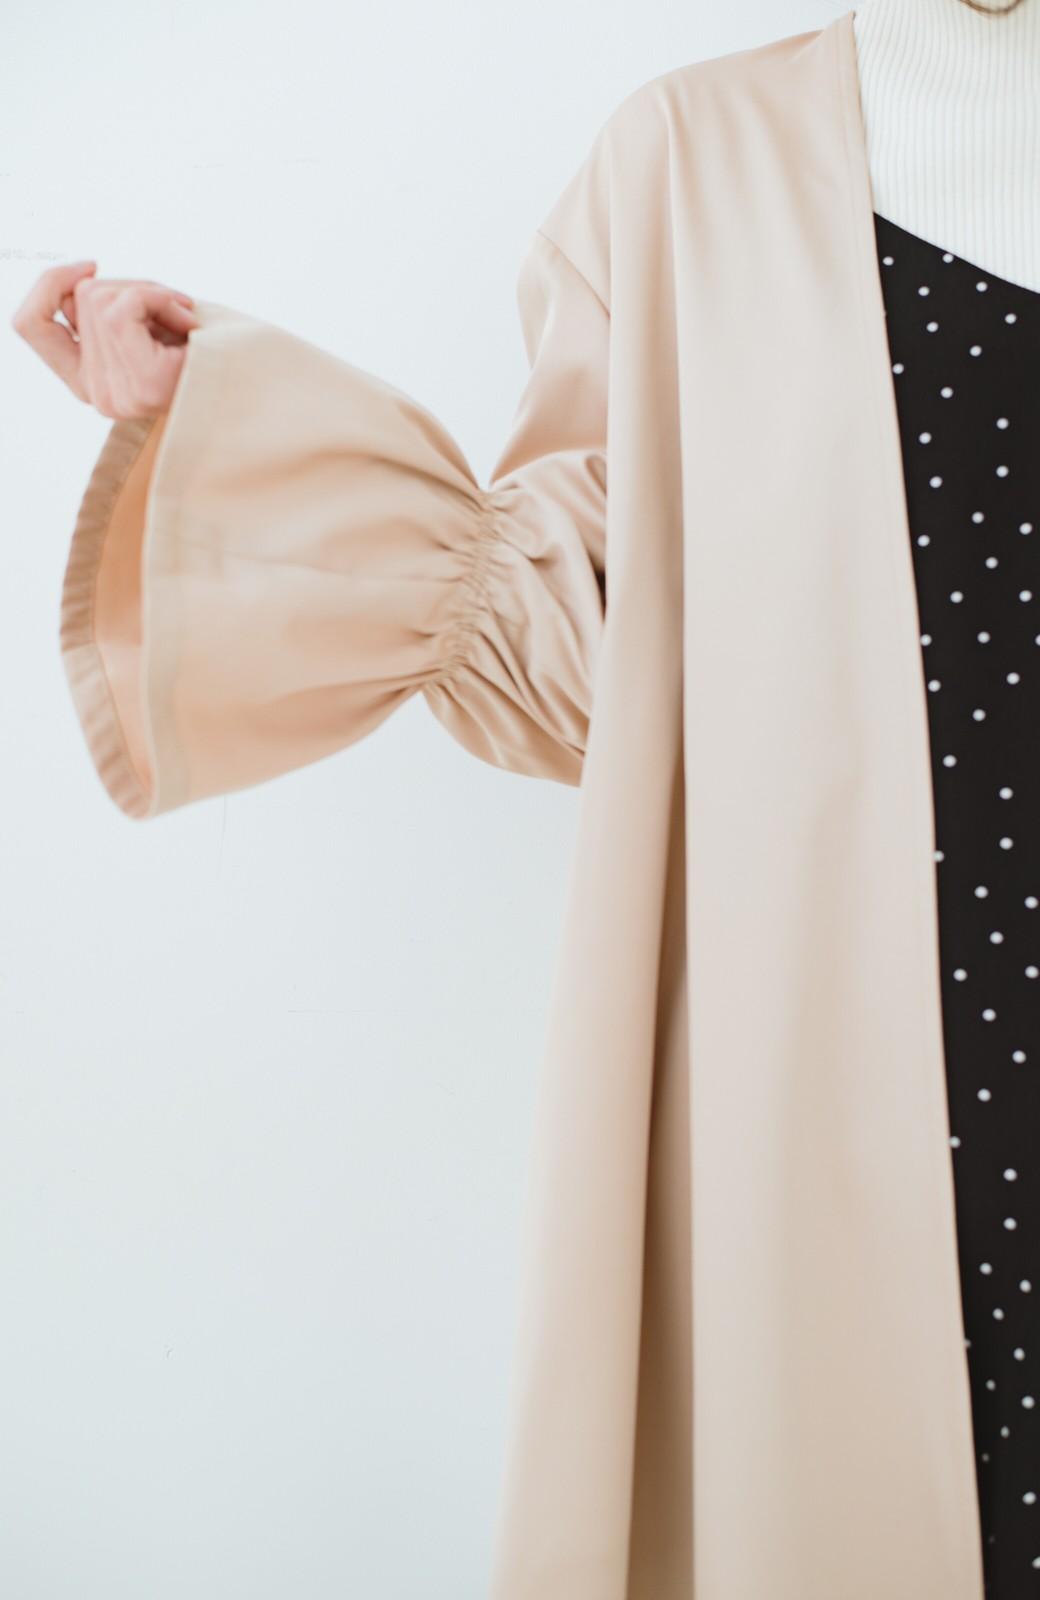 haco! ただ羽織るだけでオシャレに見える 気軽なフレアースリーブコート <ベージュ>の商品写真3